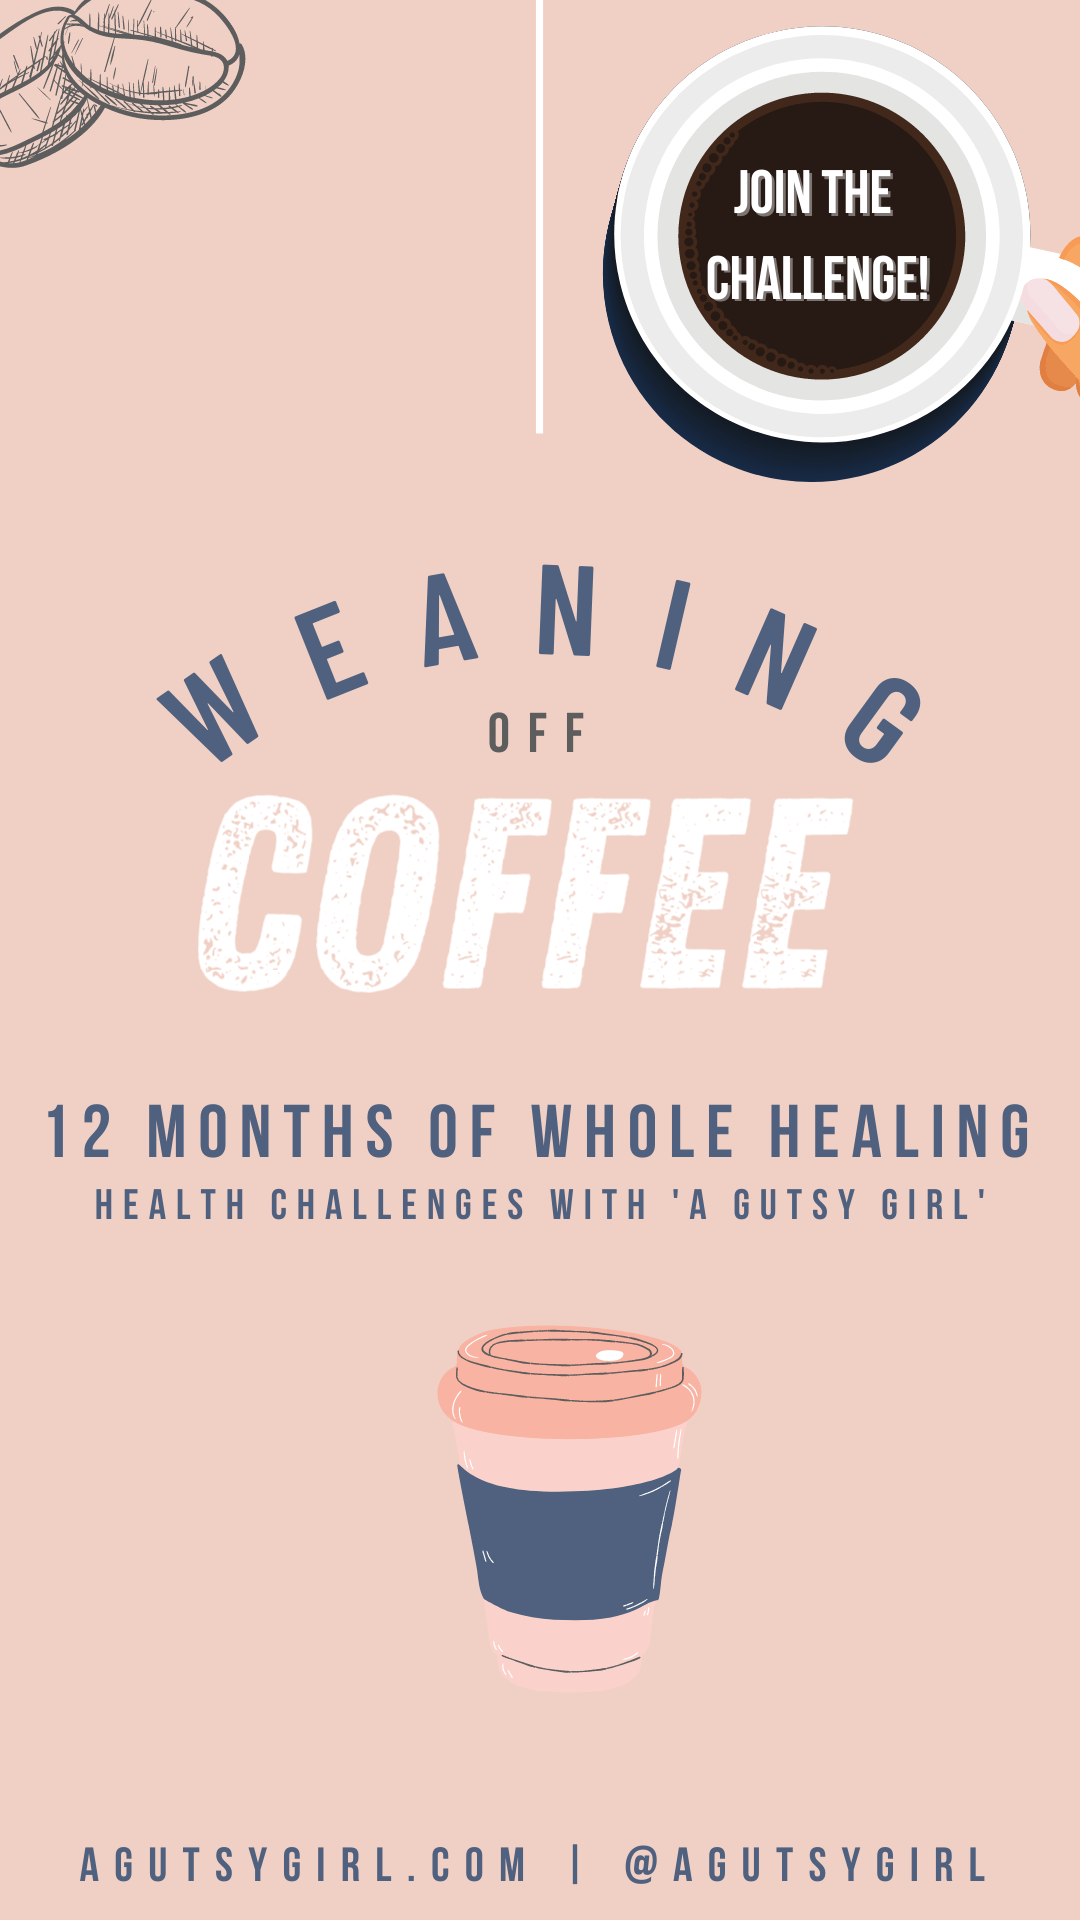 Weaning Off Coffee challenge with A Gutsy Girl agutsygirl.com #coffee #caffeine #weaningoffcaffeine #guthealth #healthchallenge